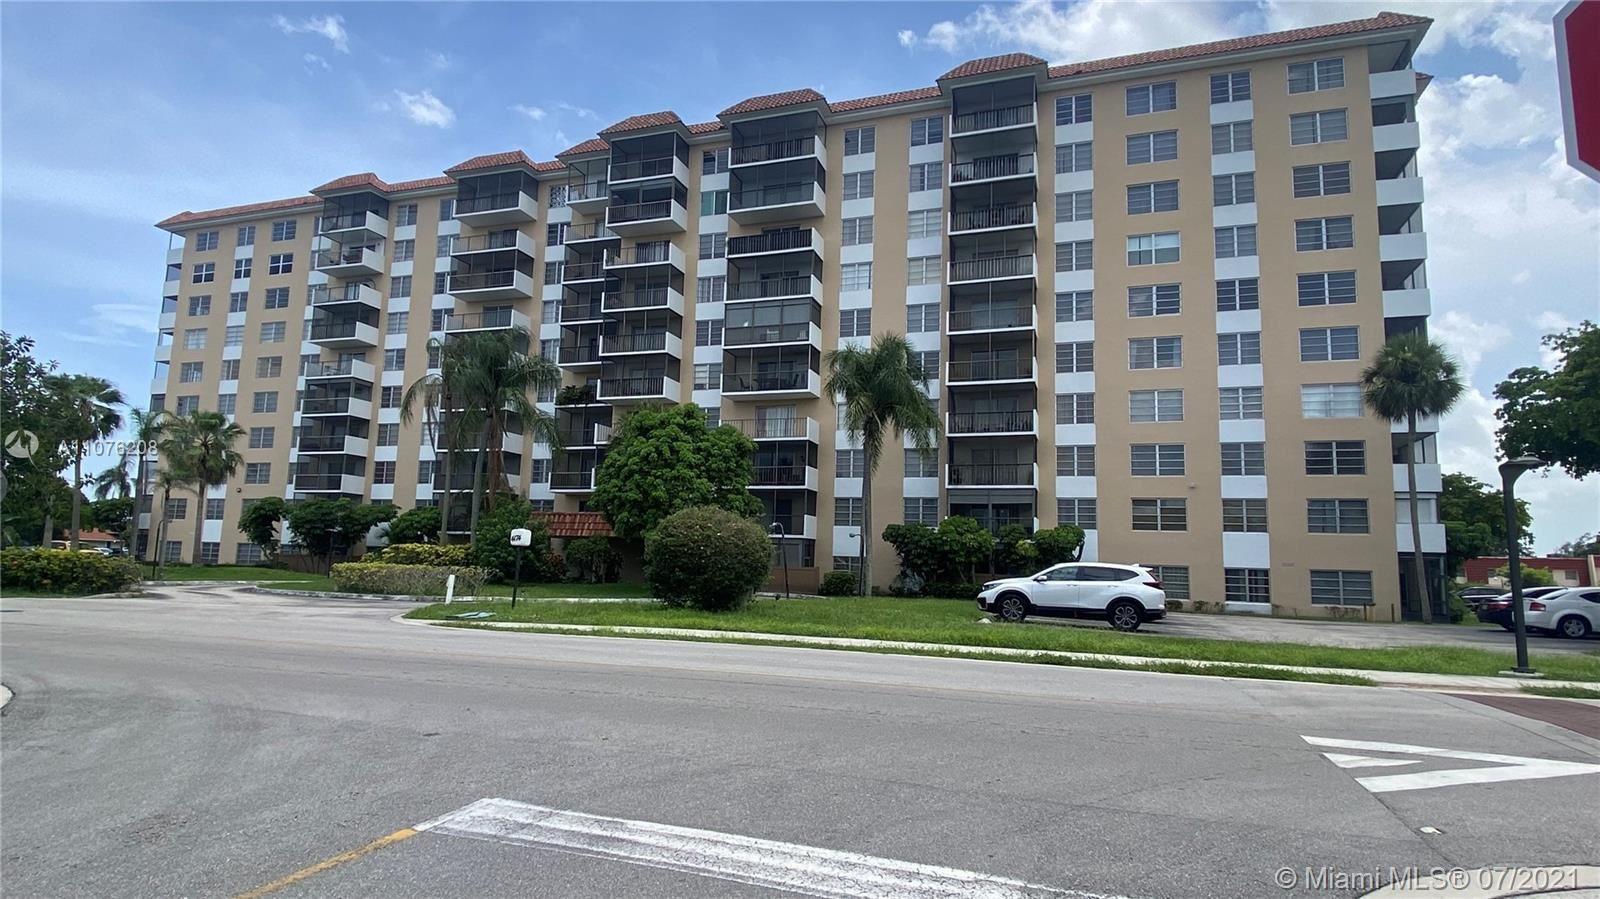 Photo of 4174 Inverrary Dr #306, Lauderhill, FL 33319 (MLS # A11076208)